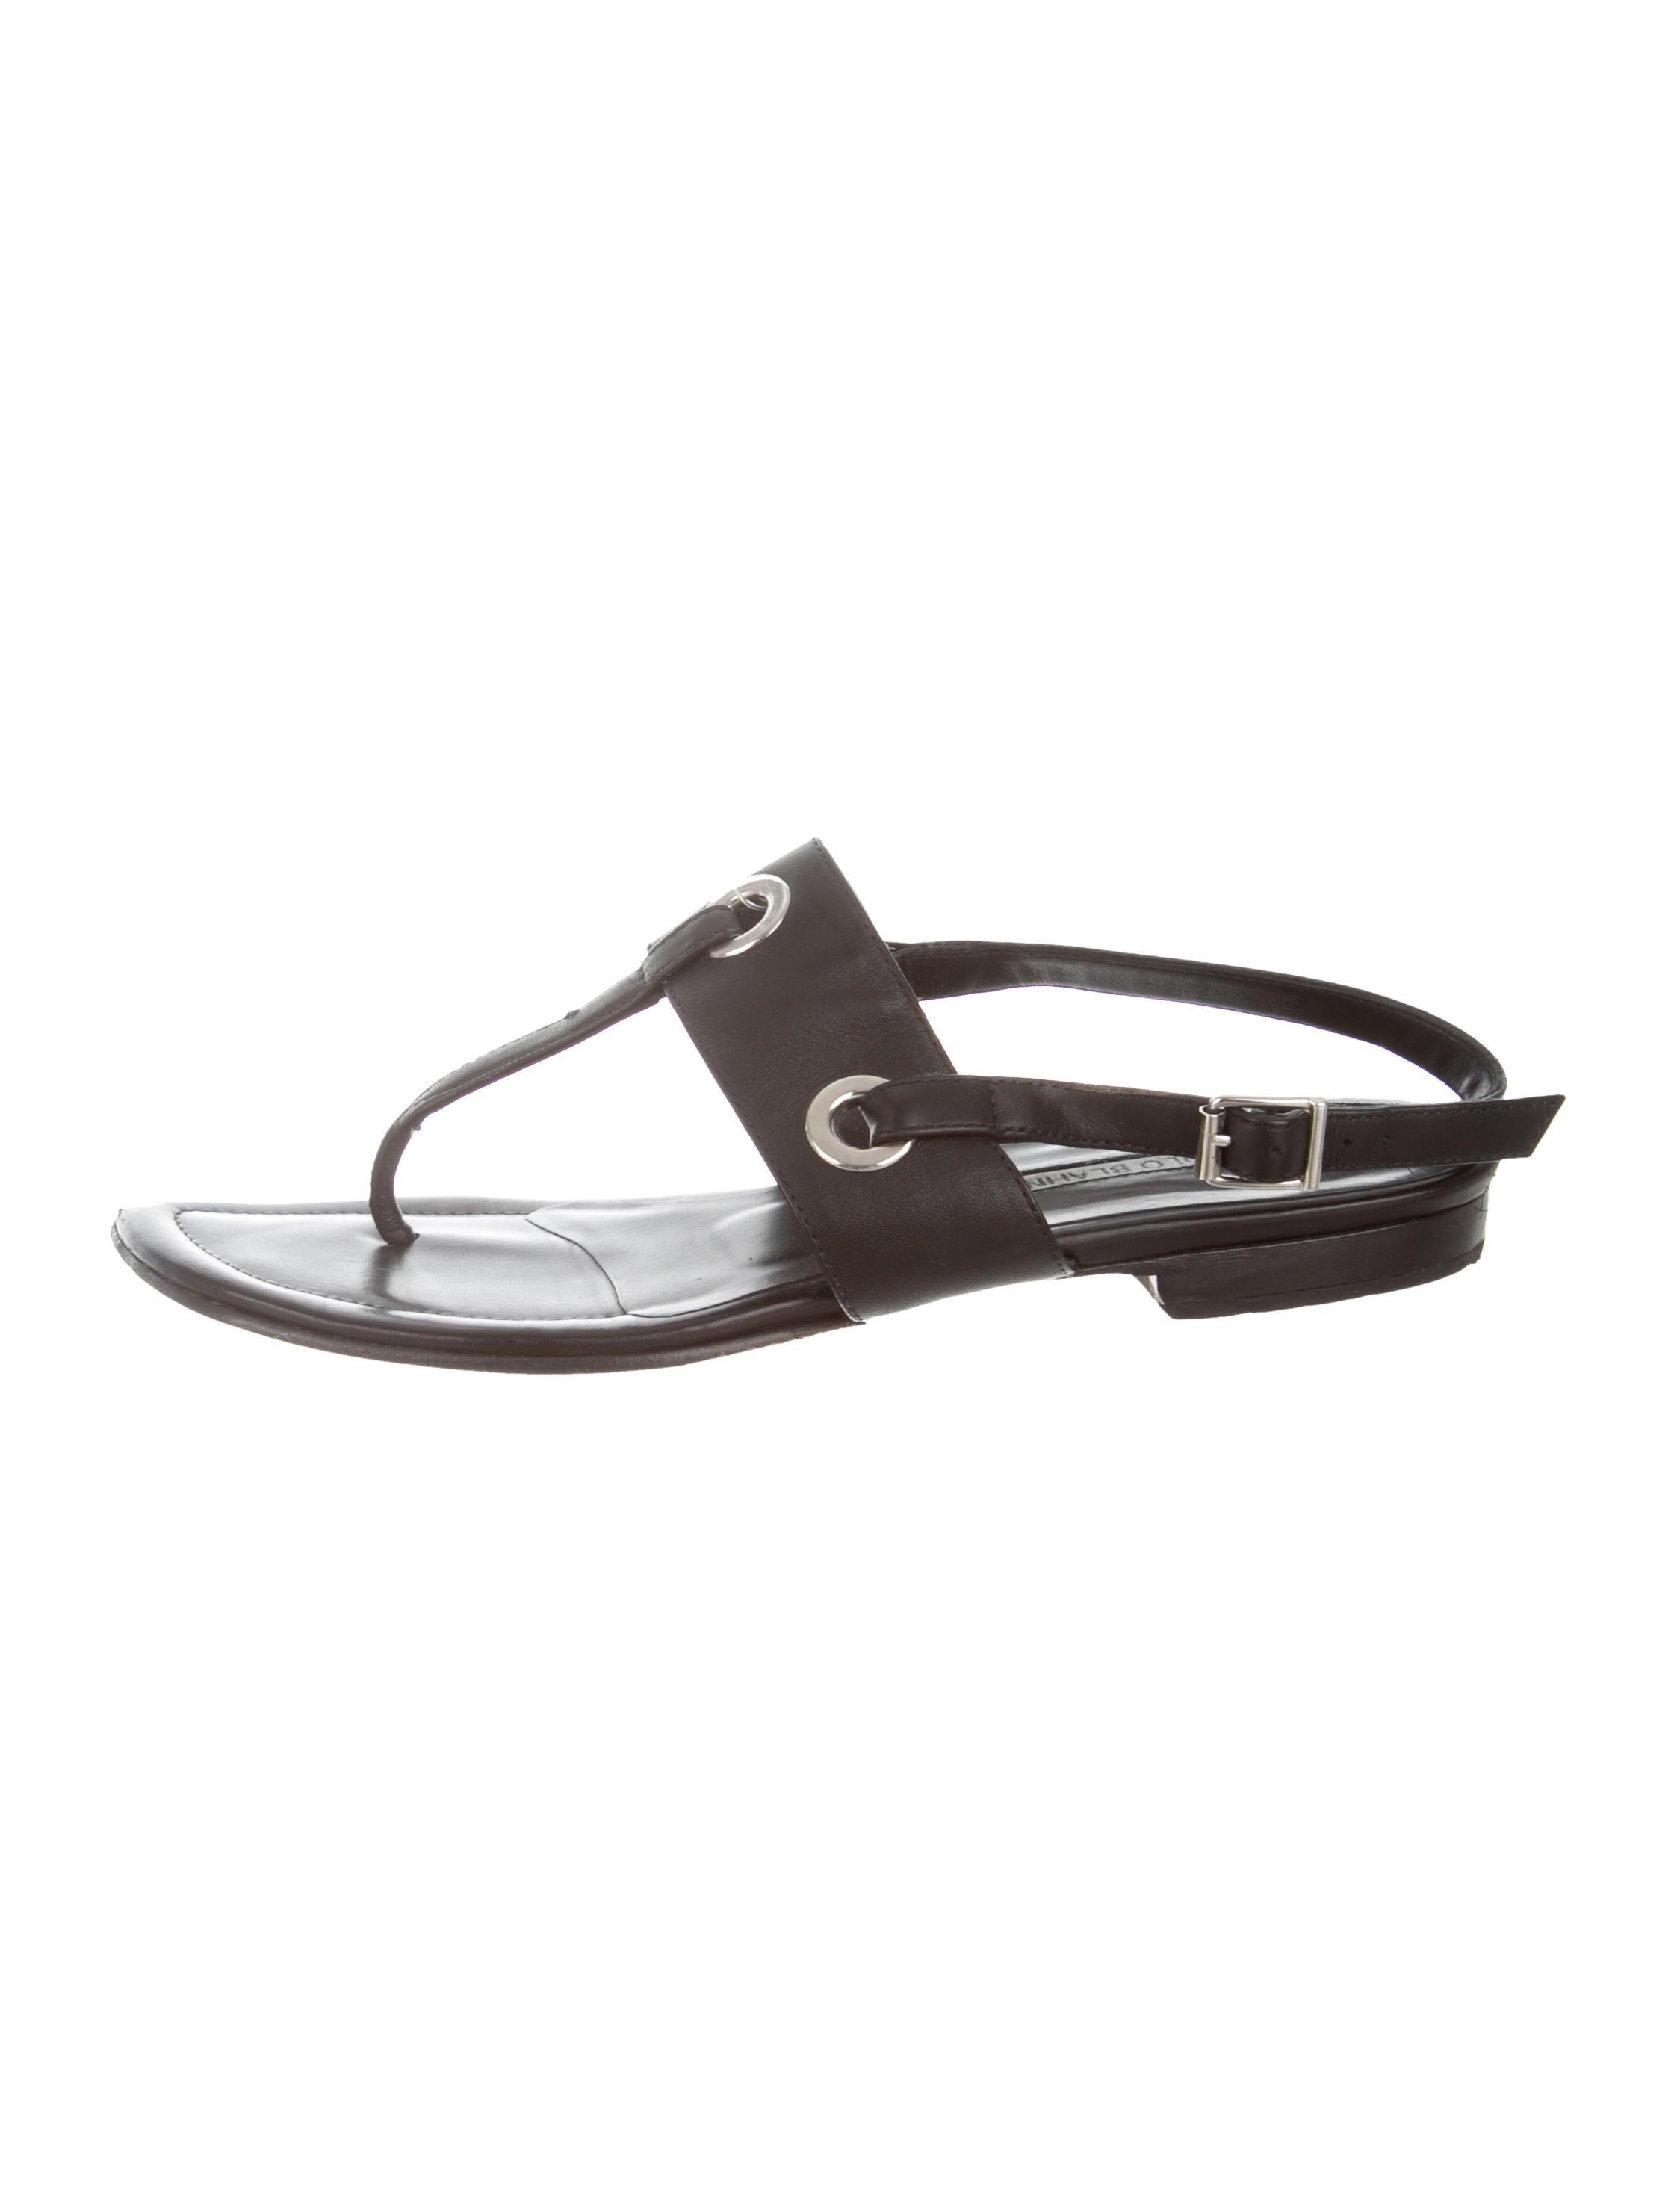 5971dc08a Manolo Blahnik Leather Slingback Sandals - Shoes - MOO109273